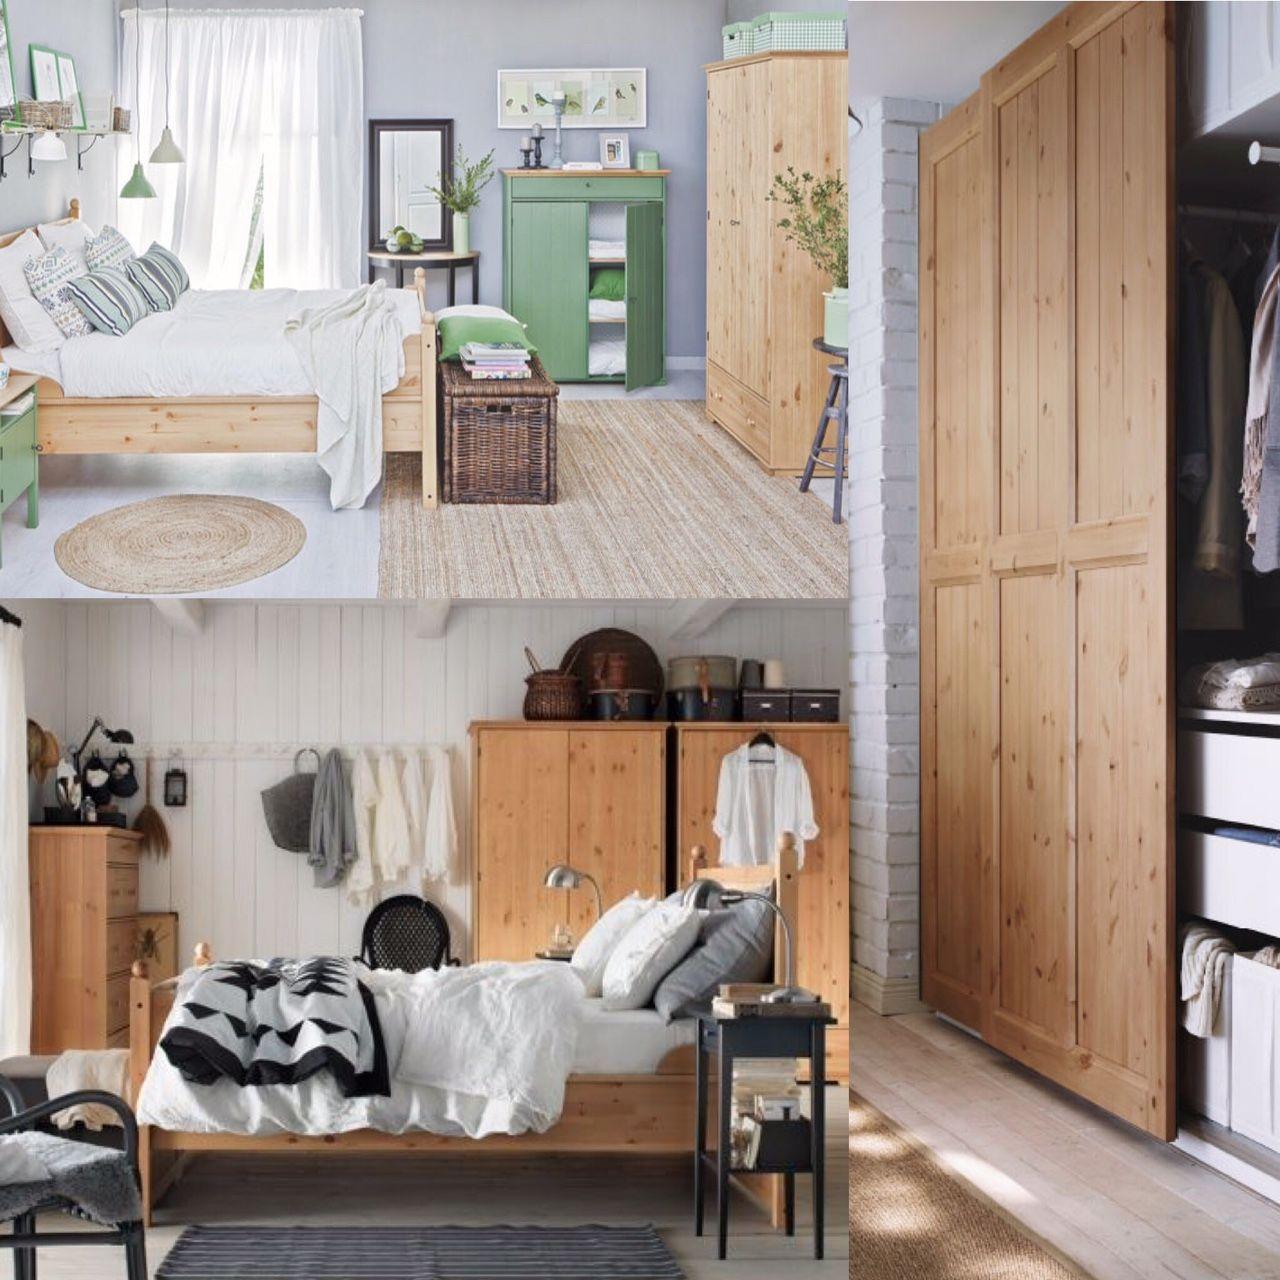 Ikea Hurdal Furniture Furniture Relaxing Bedroom Ikea Hurdal